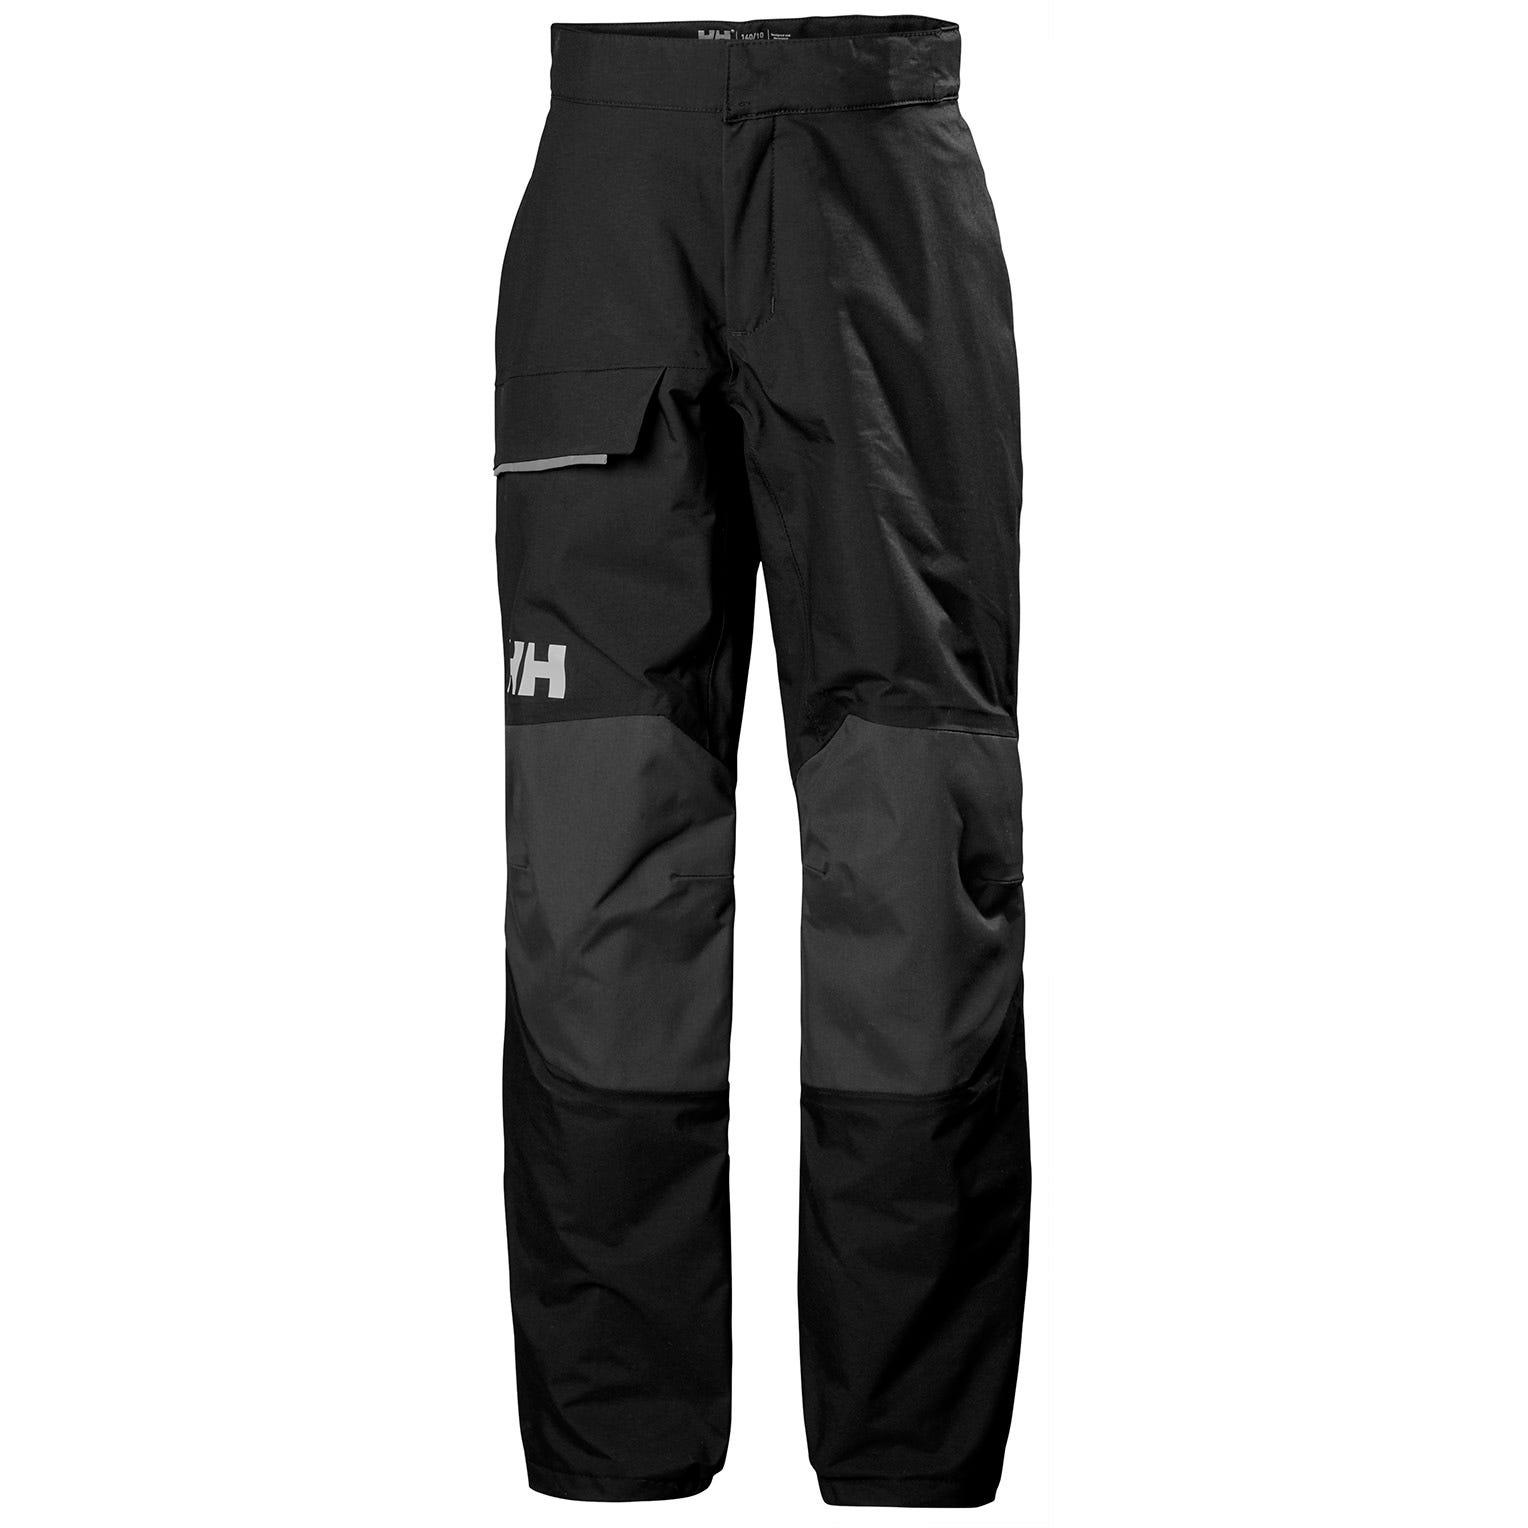 Helly Hansen Junior Border Pant Kids Black 128/8